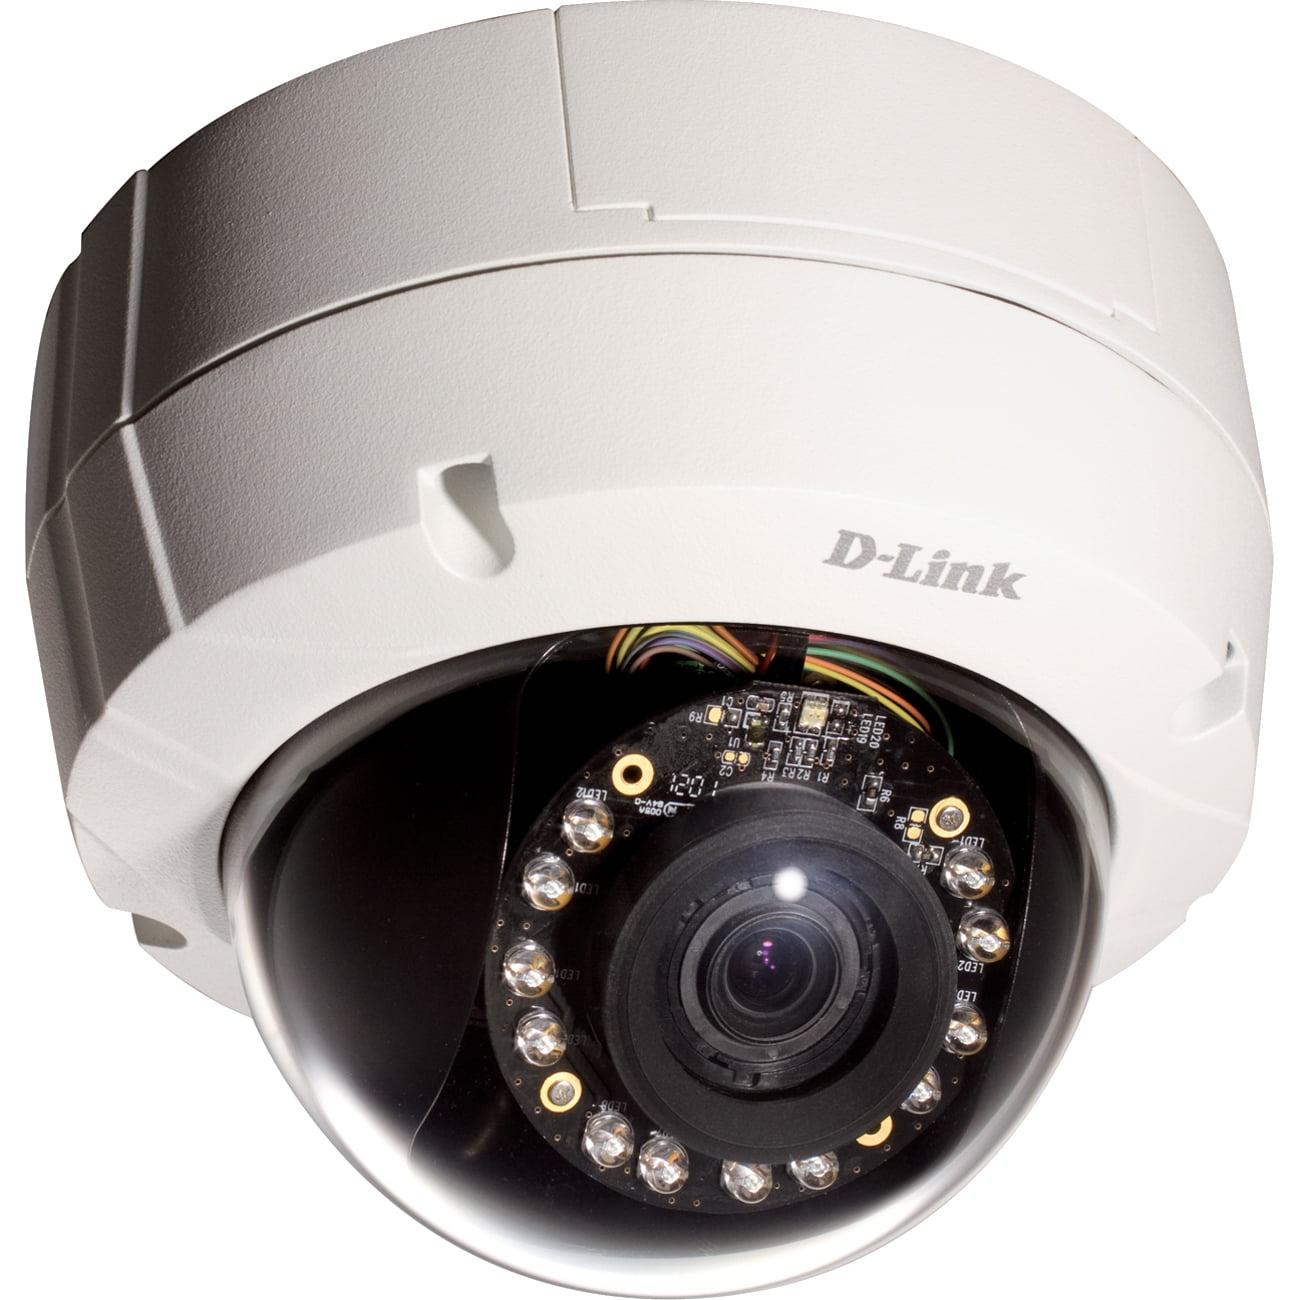 D-Link DCS-6513 3 Megapixel Surveillance Camera 1920 x 1080 (Refurbished) by D-Link